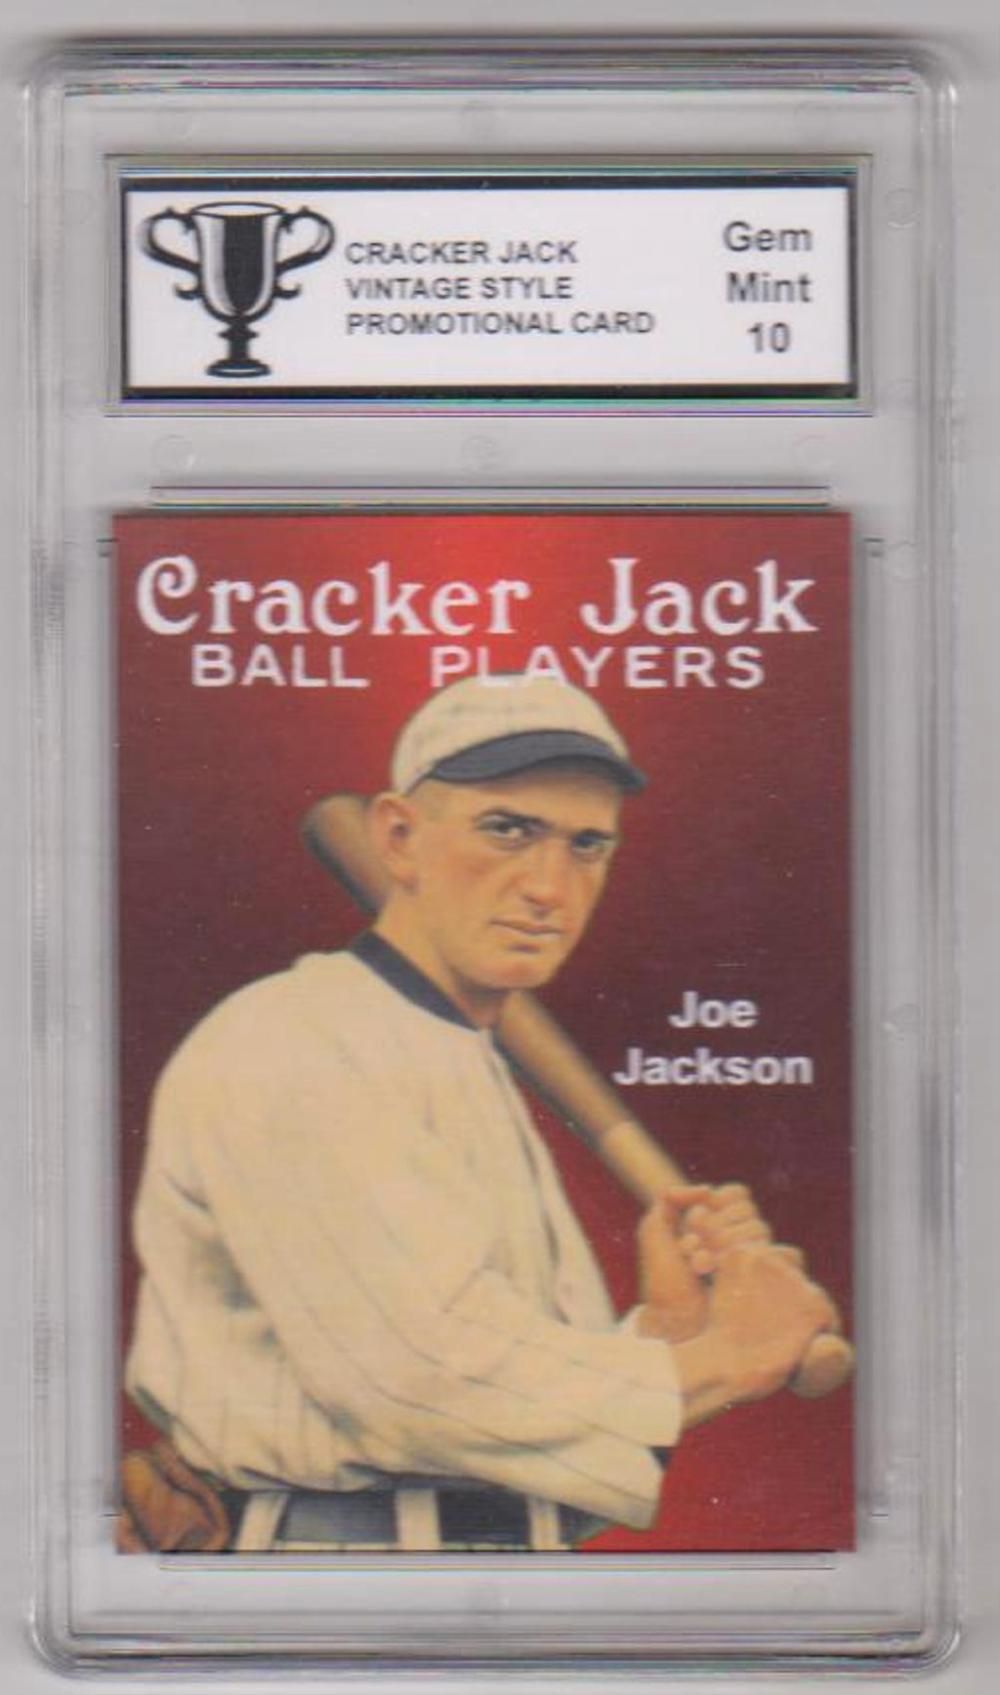 Graded Gem Mint 10 Shoeless Joe Jackson Cracker Jack Vinta